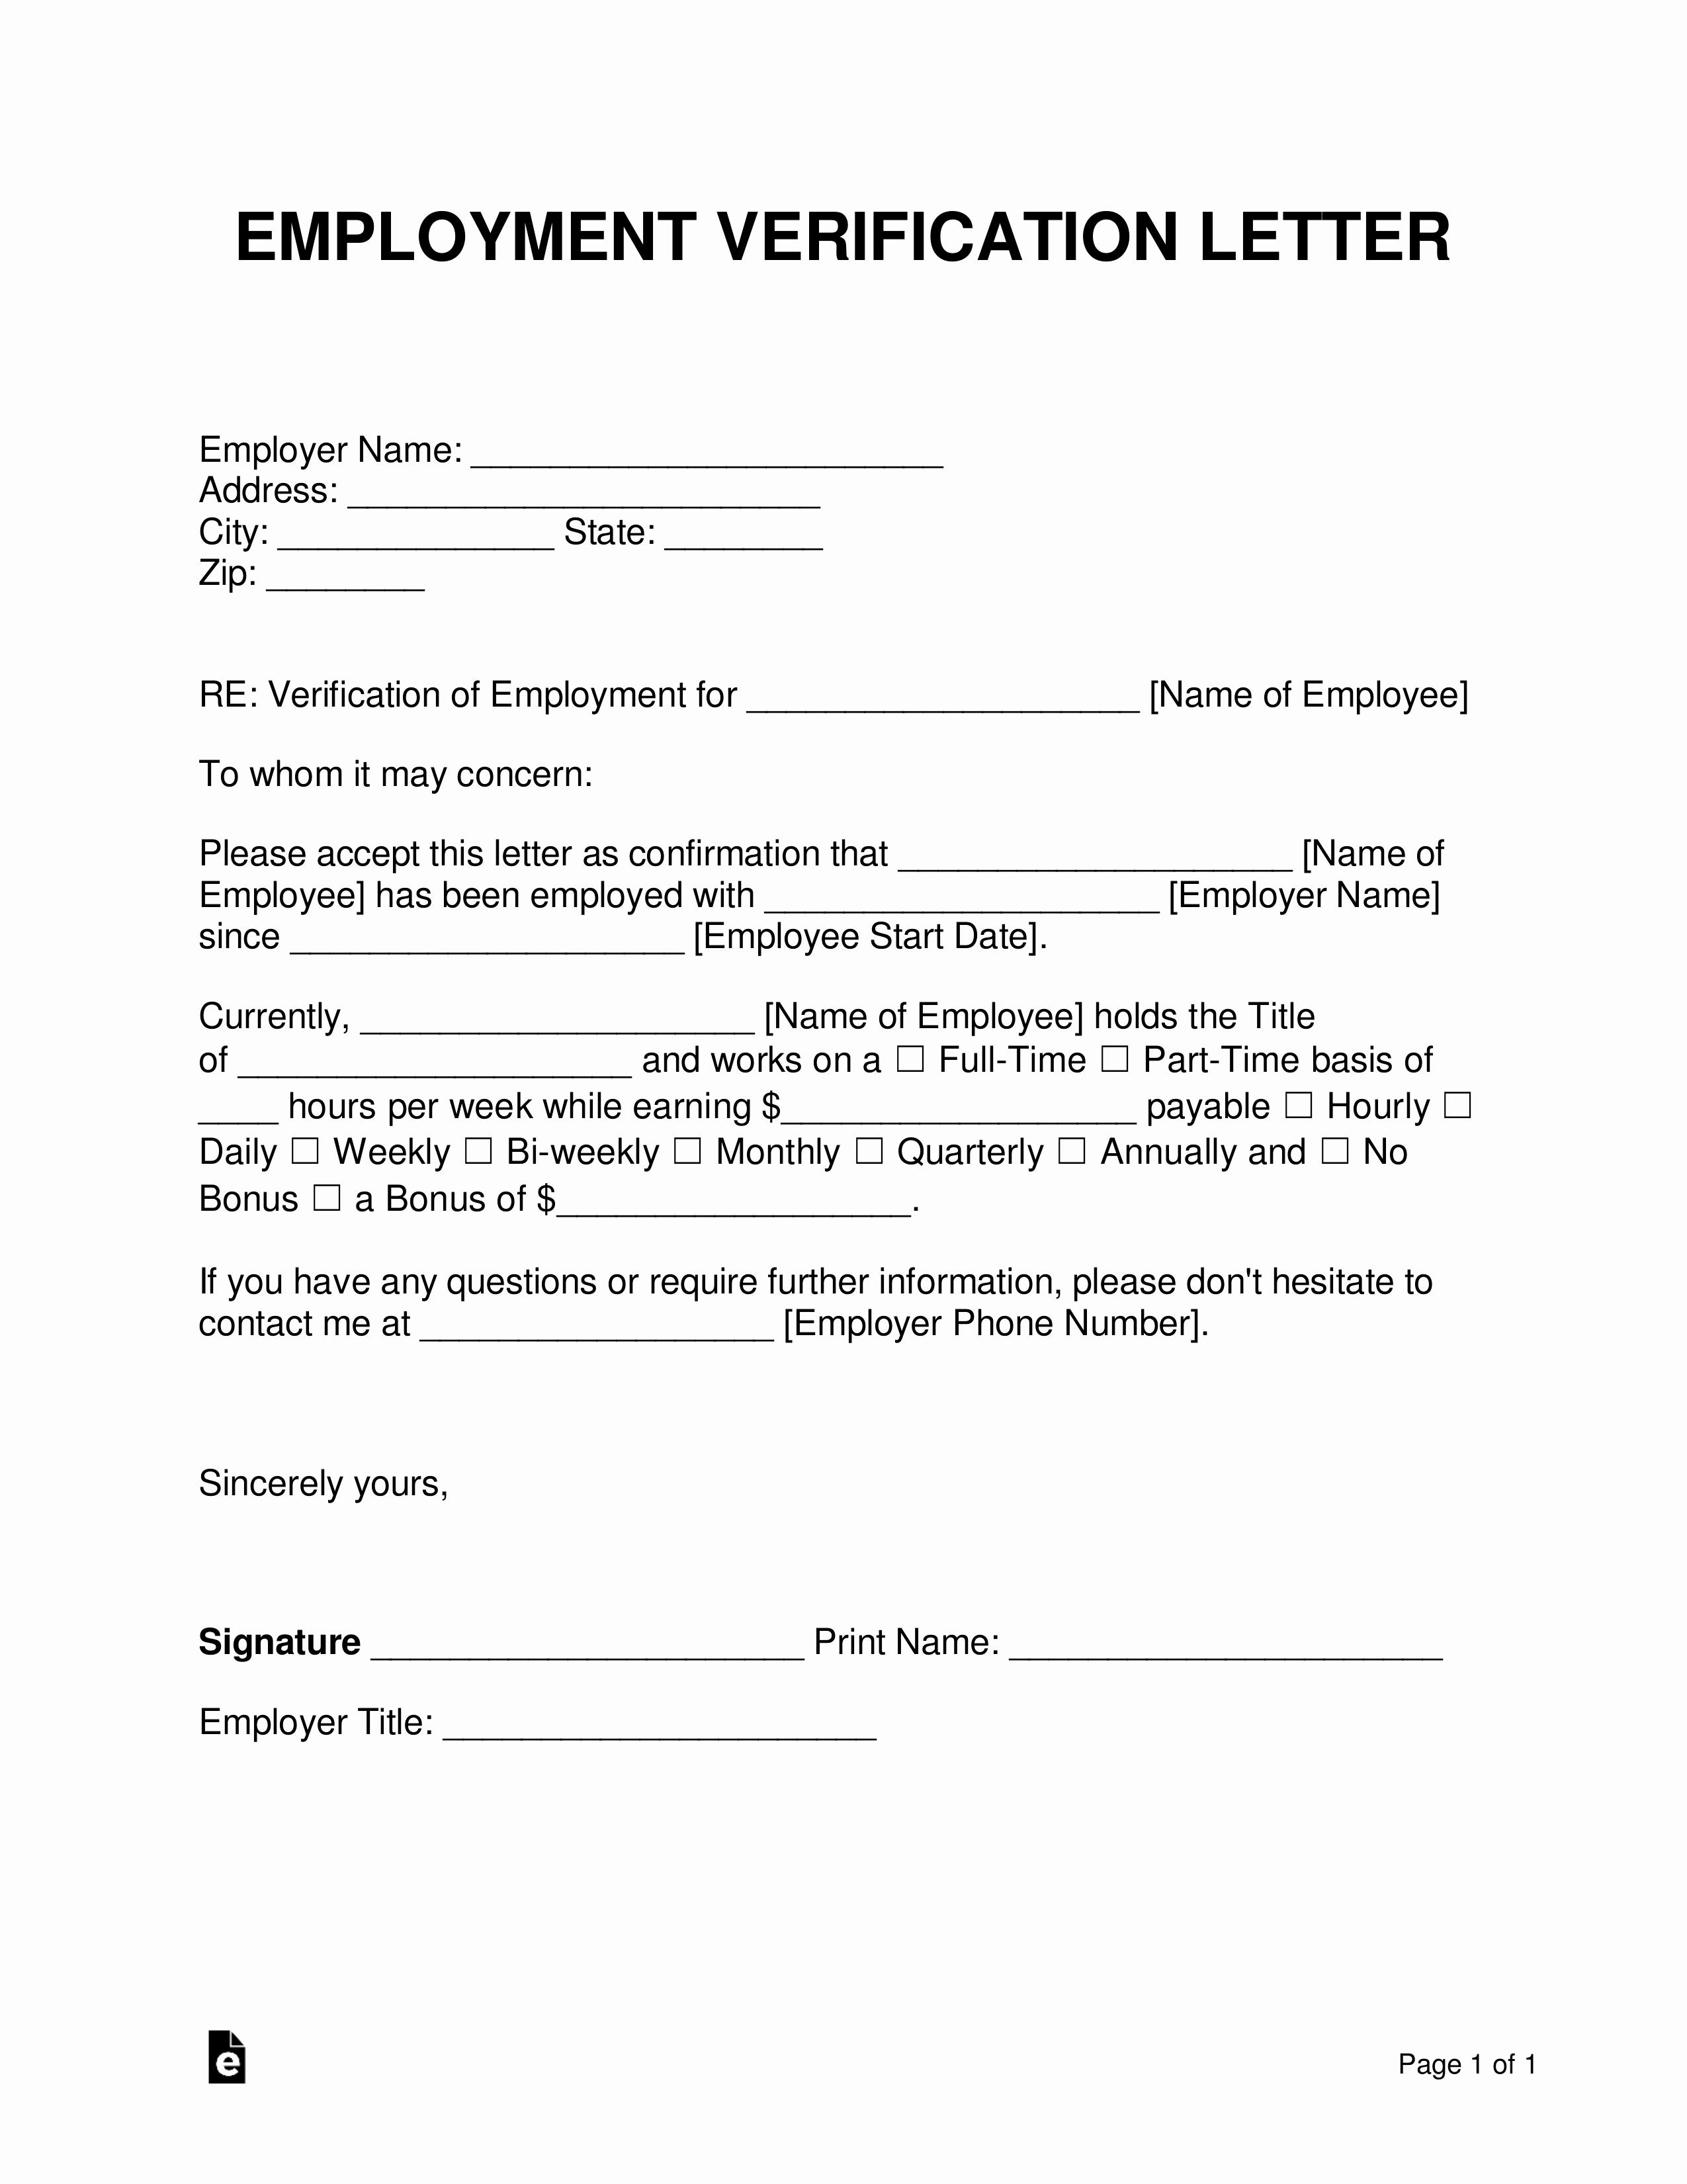 Employment Verification Release form Elegant Free Employment In E Verification Letter Pdf